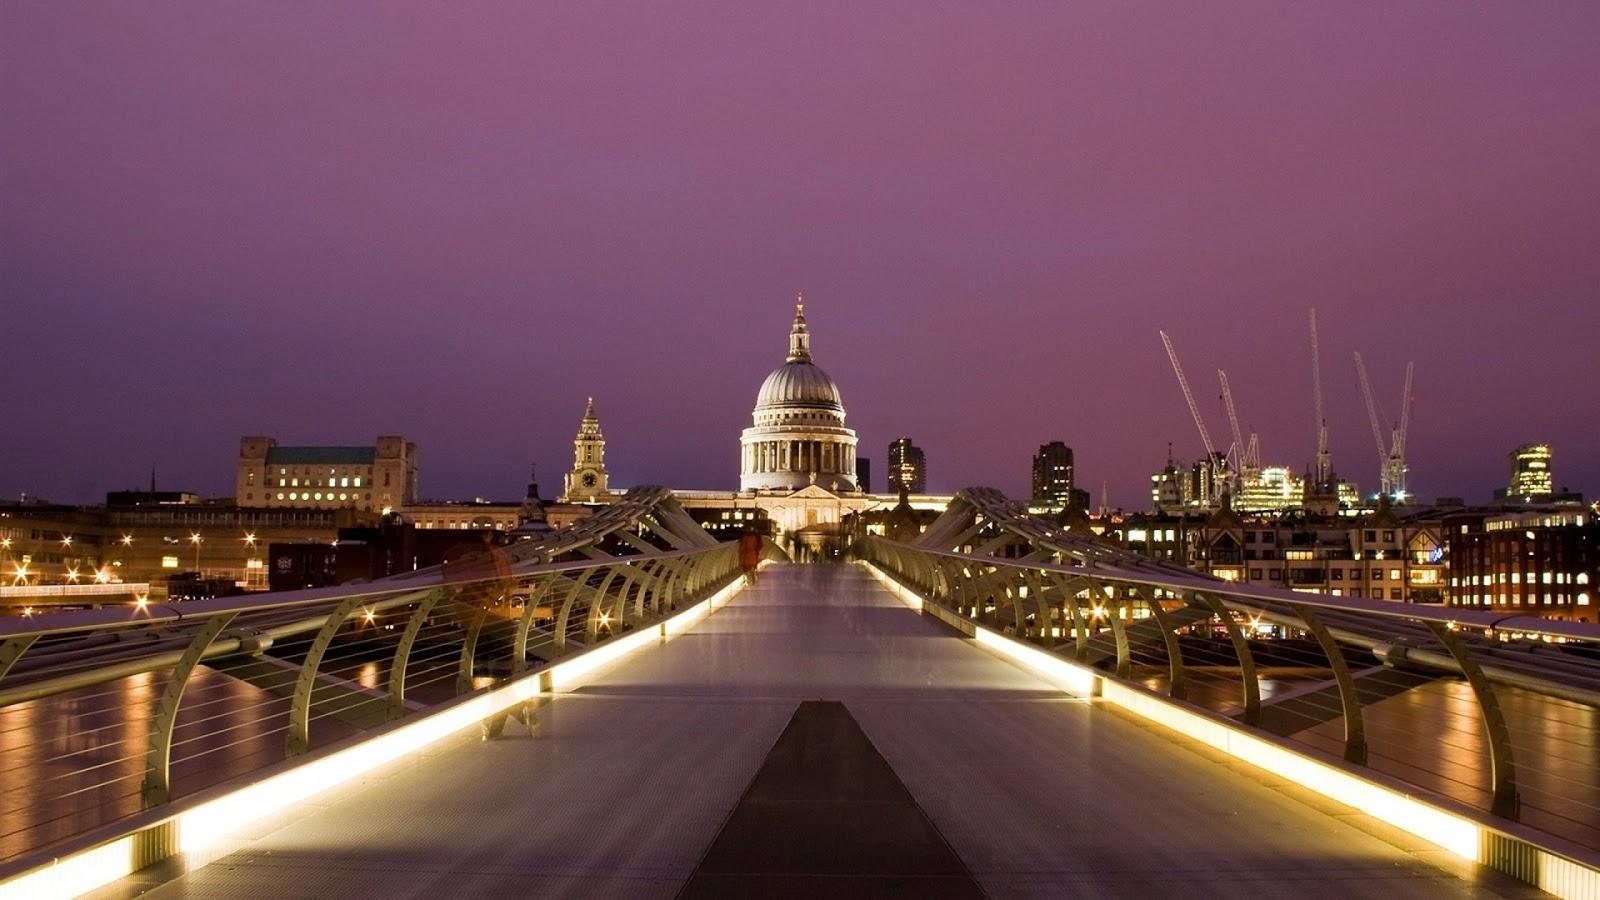 london city wallpapers - photo #4